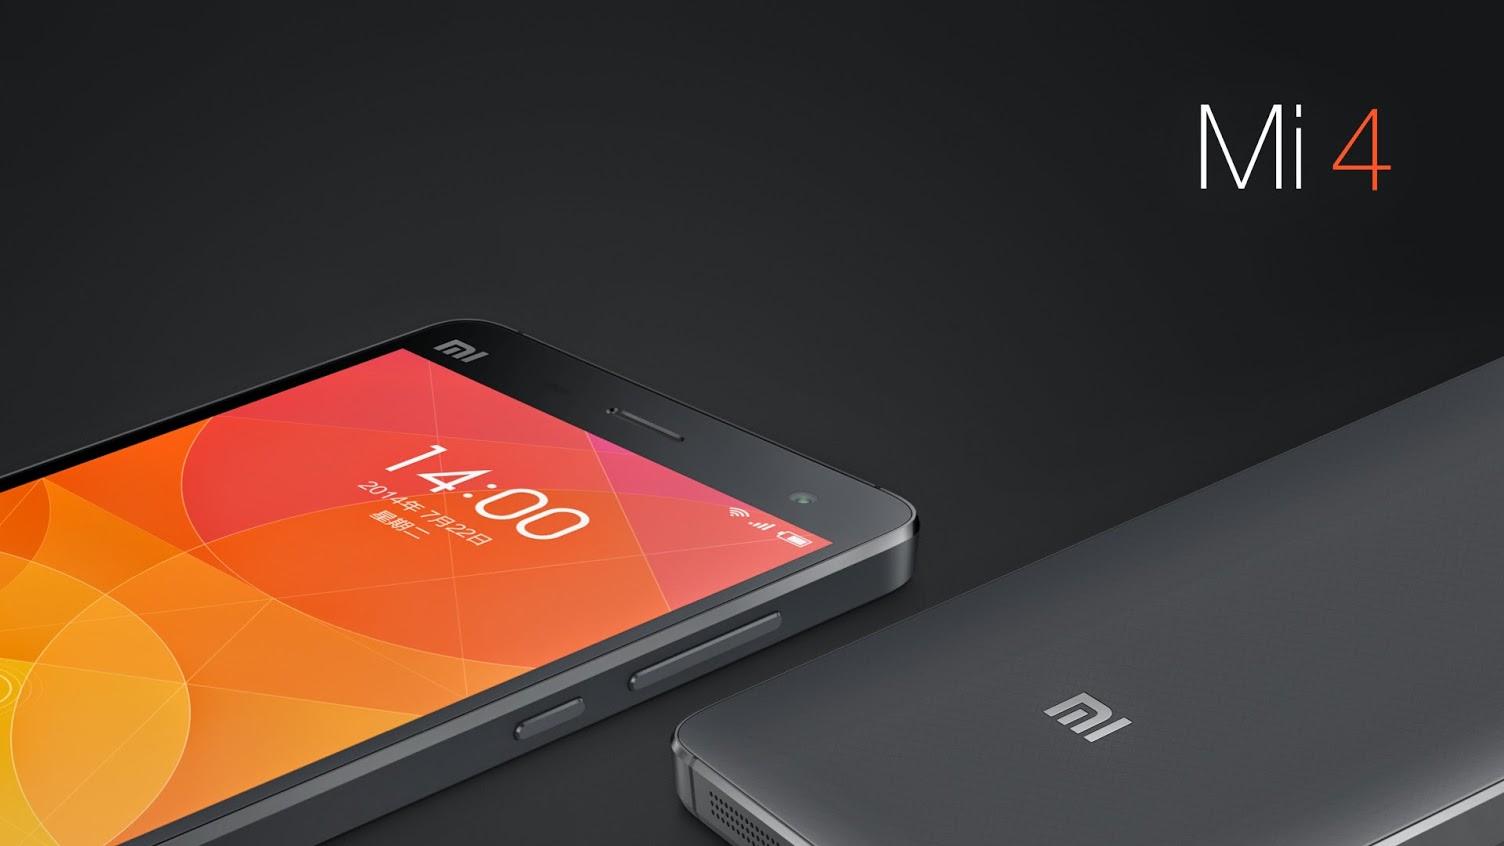 Xiaomi-Mi-4-officially-unveiled